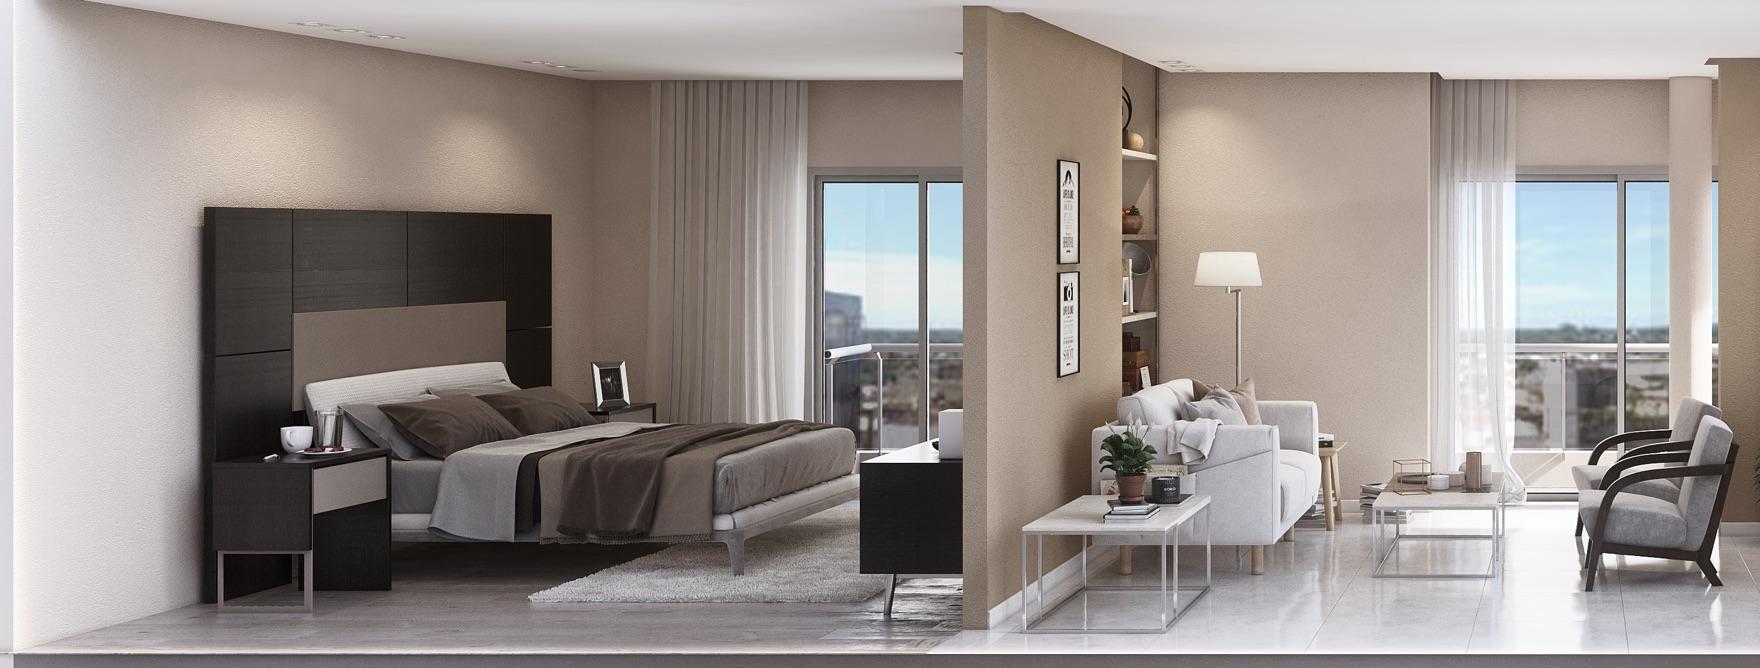 Corte dpto. 3 ambientes, vista dormitorio, living comedor